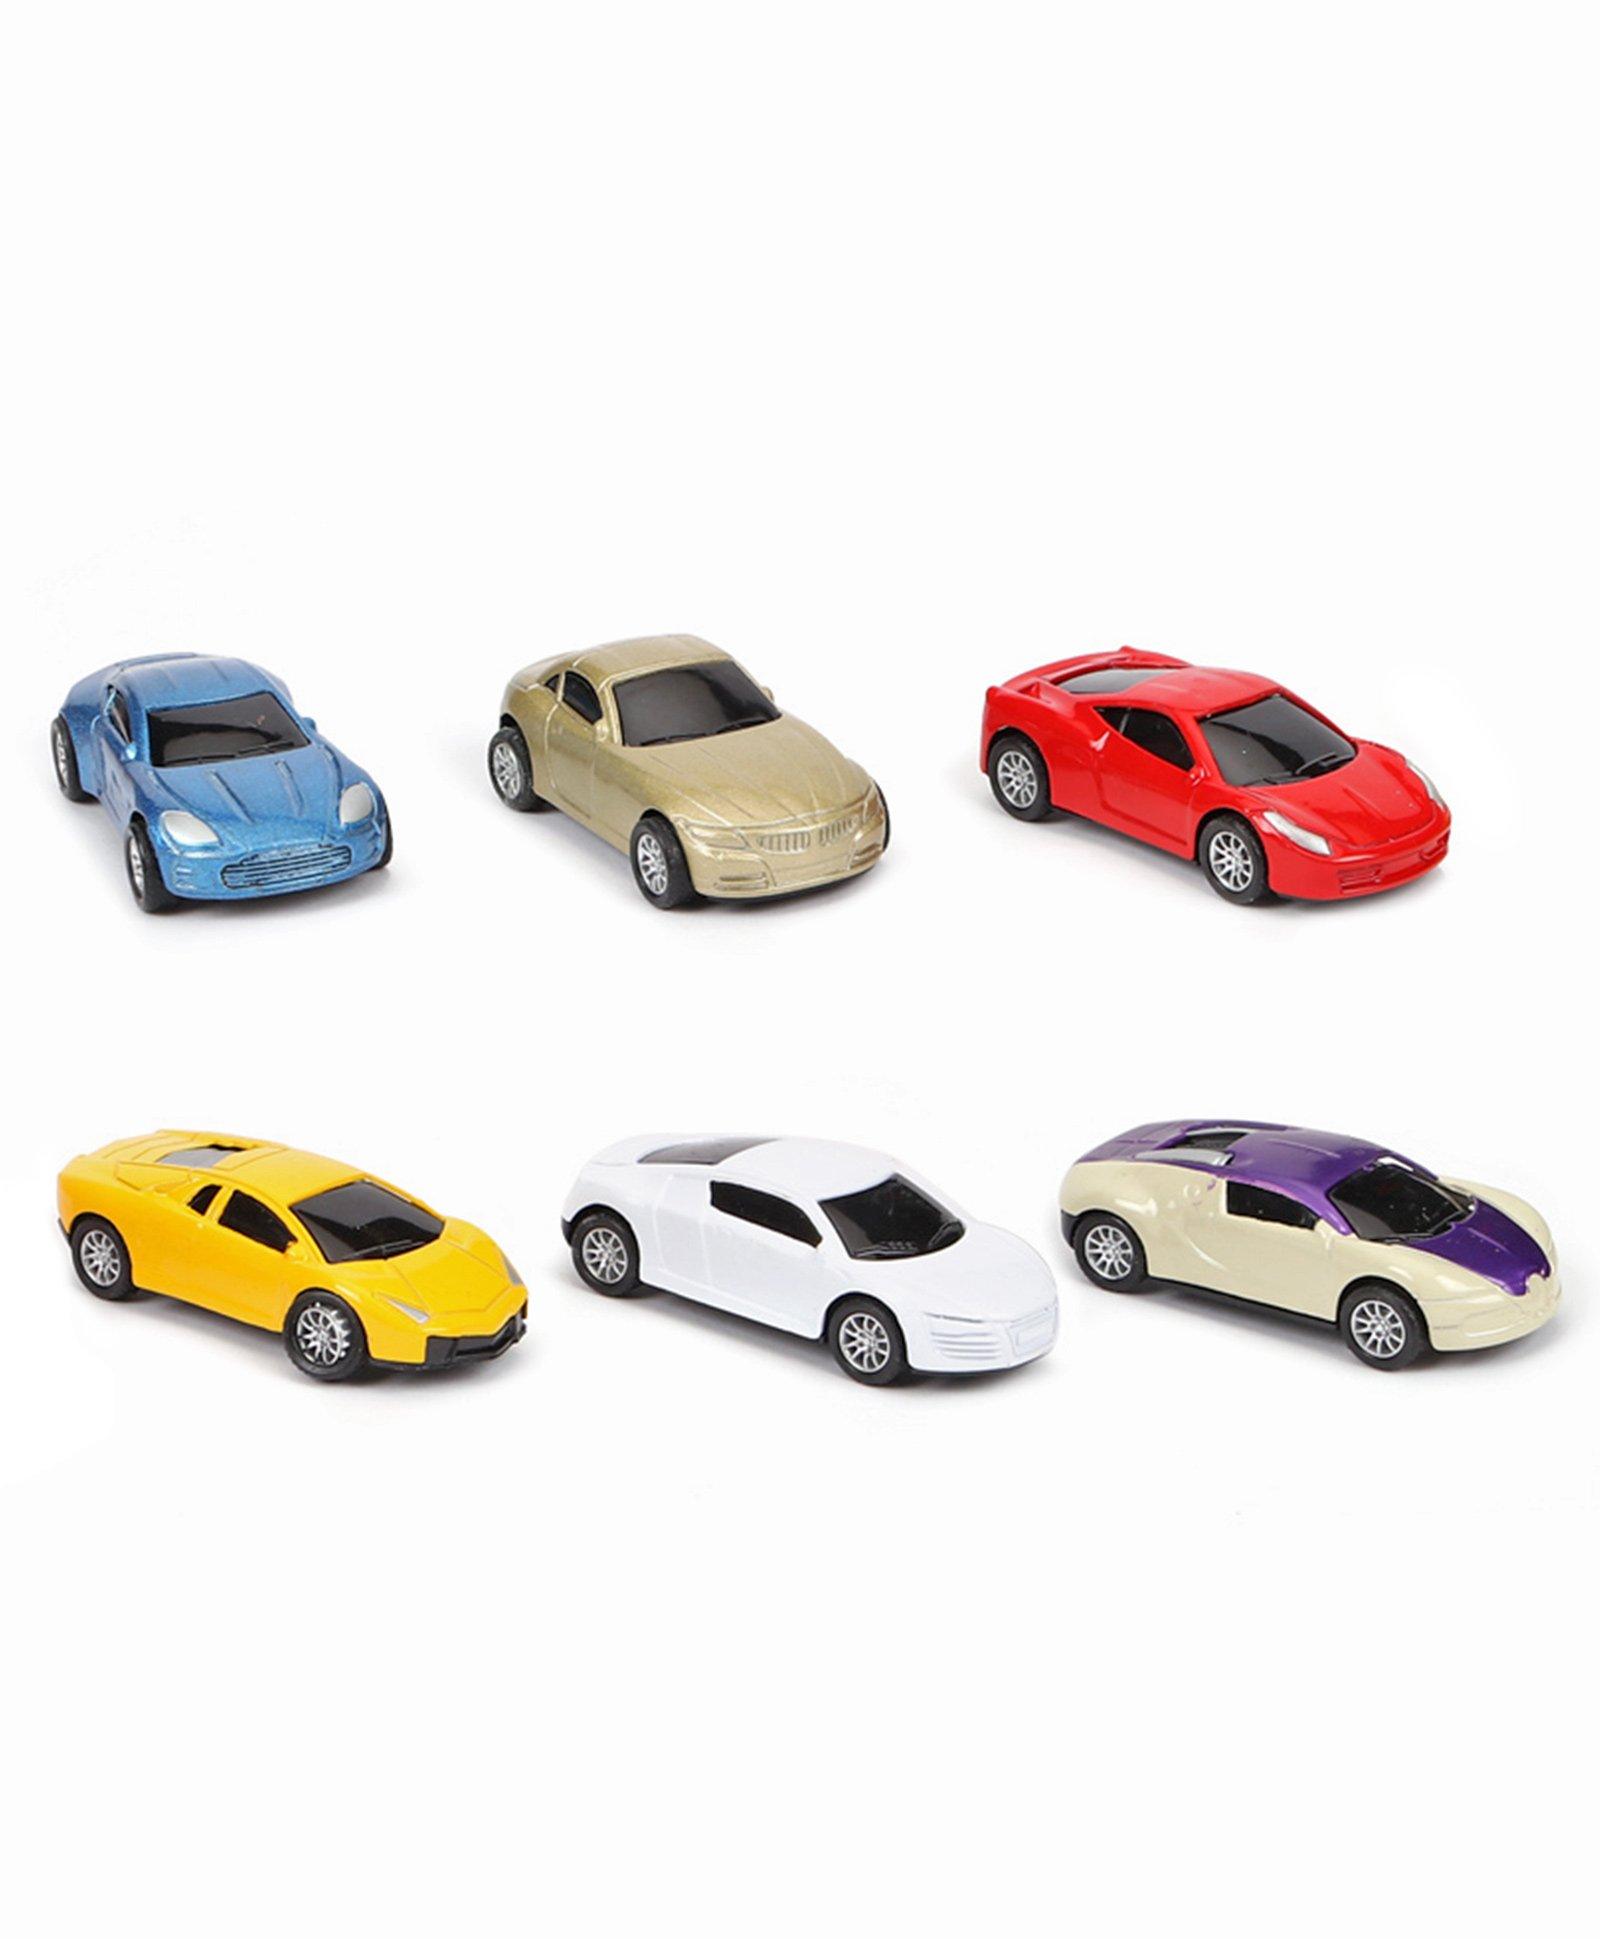 Mini Toy Cars Set Multicolor - 6 Pieces